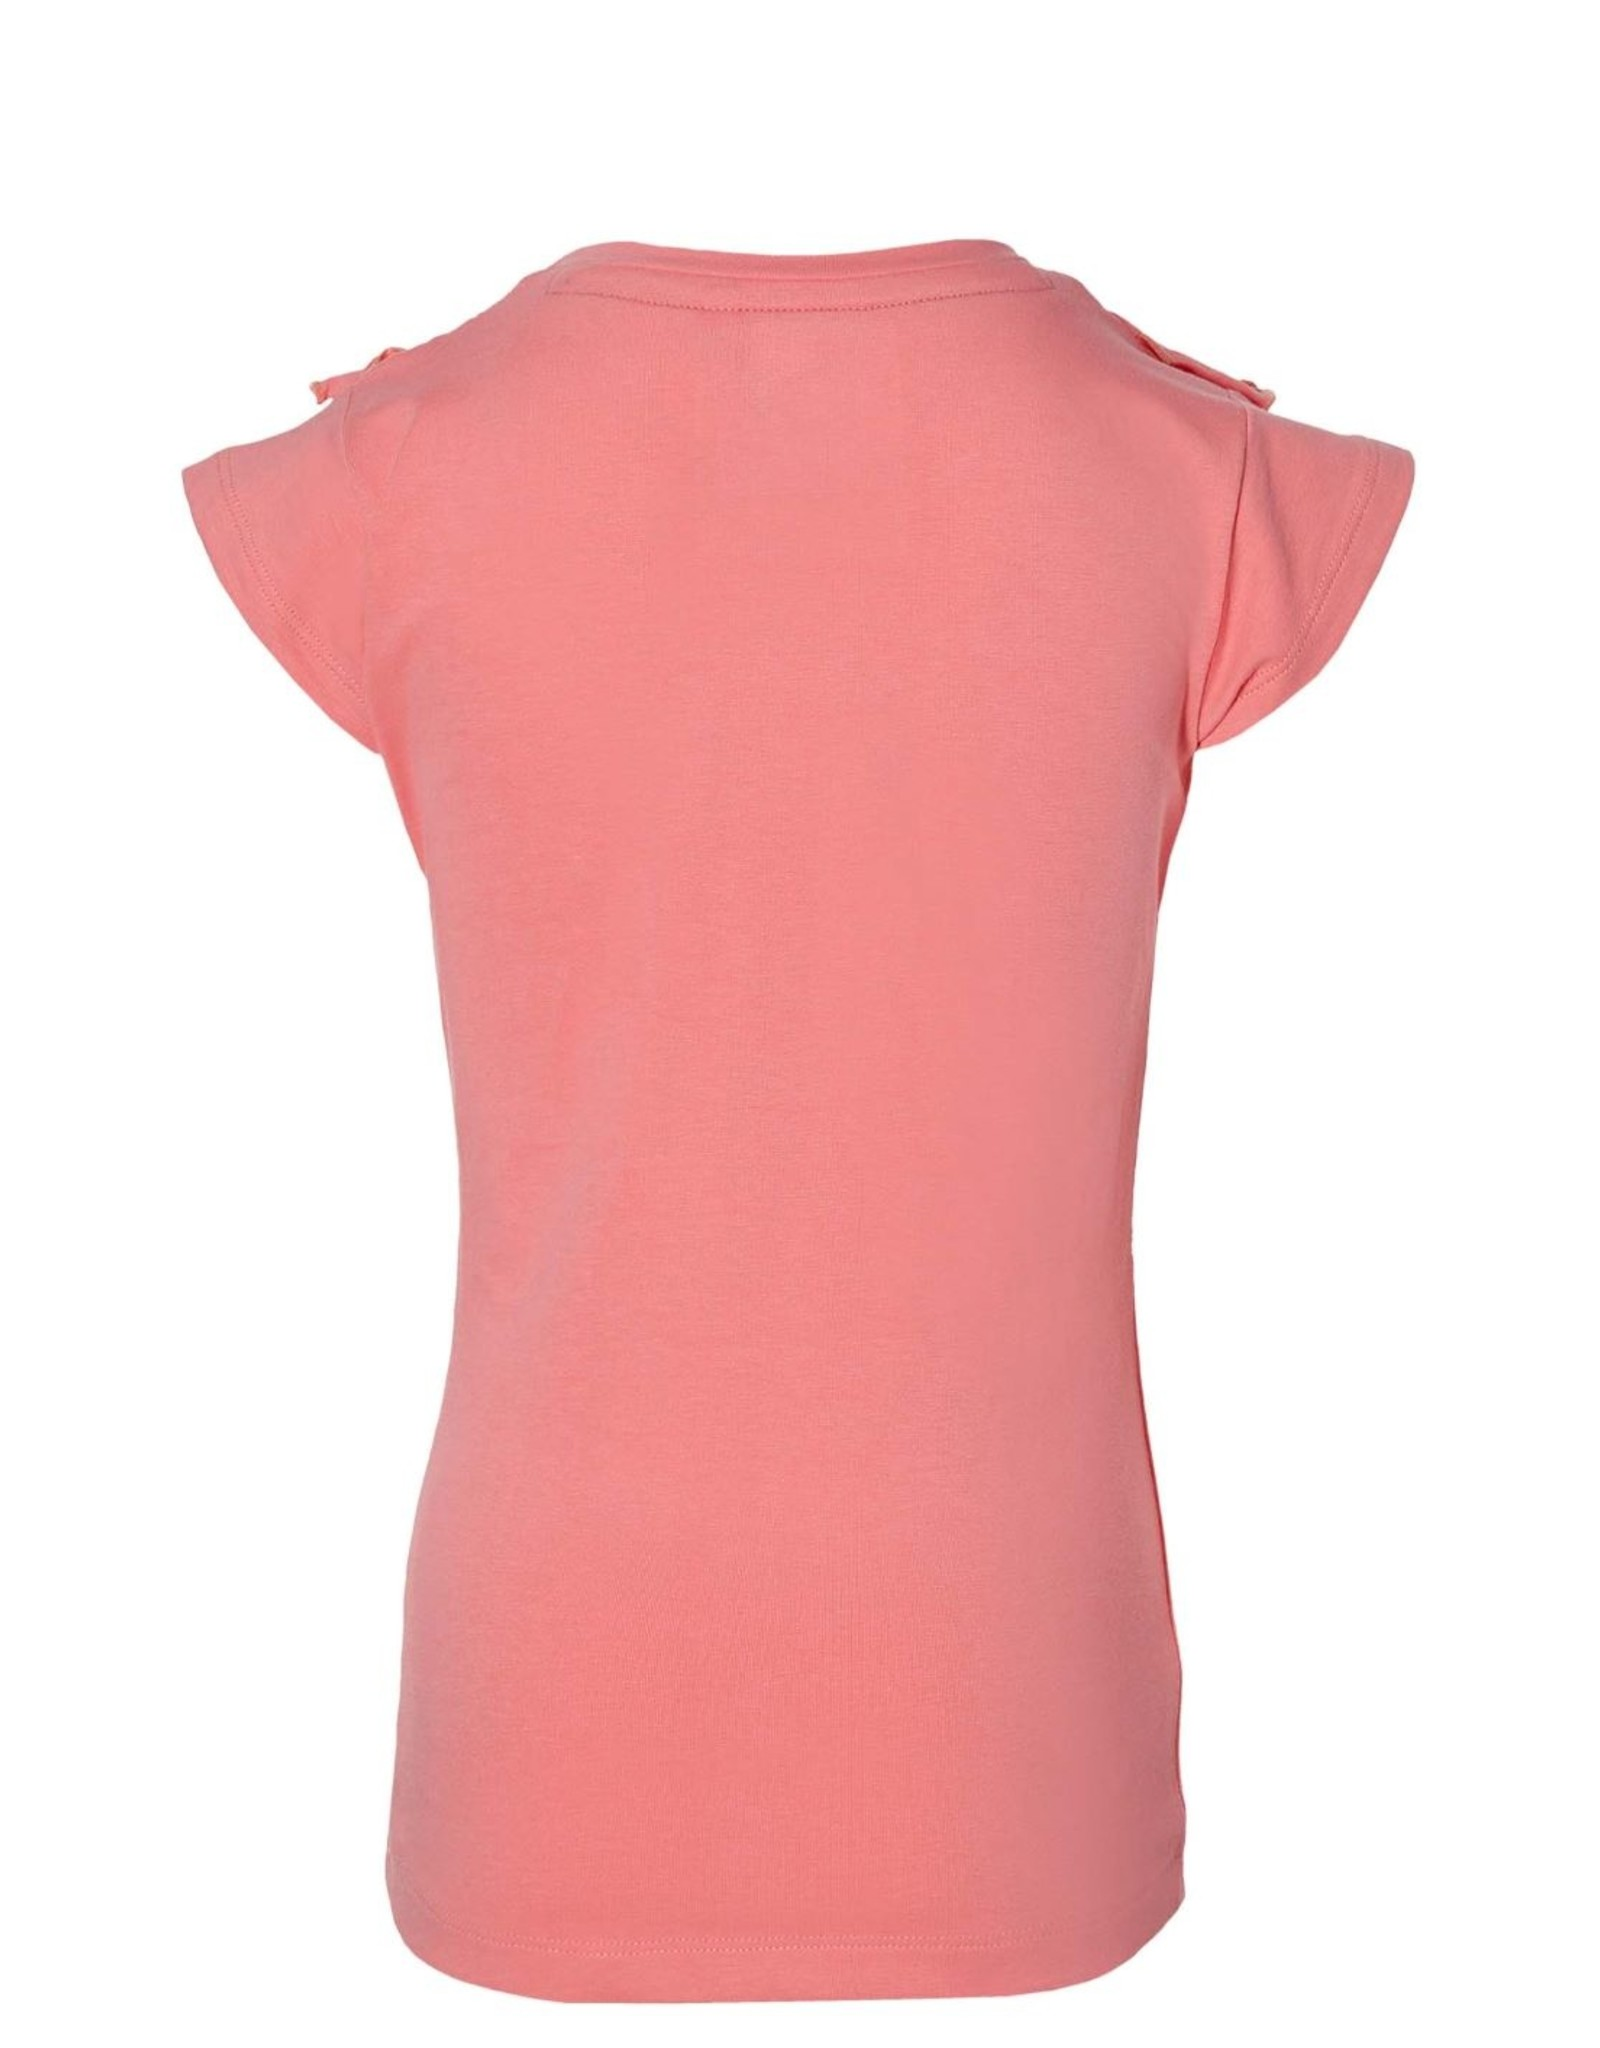 Quapi Quapi top Fayah shell pink